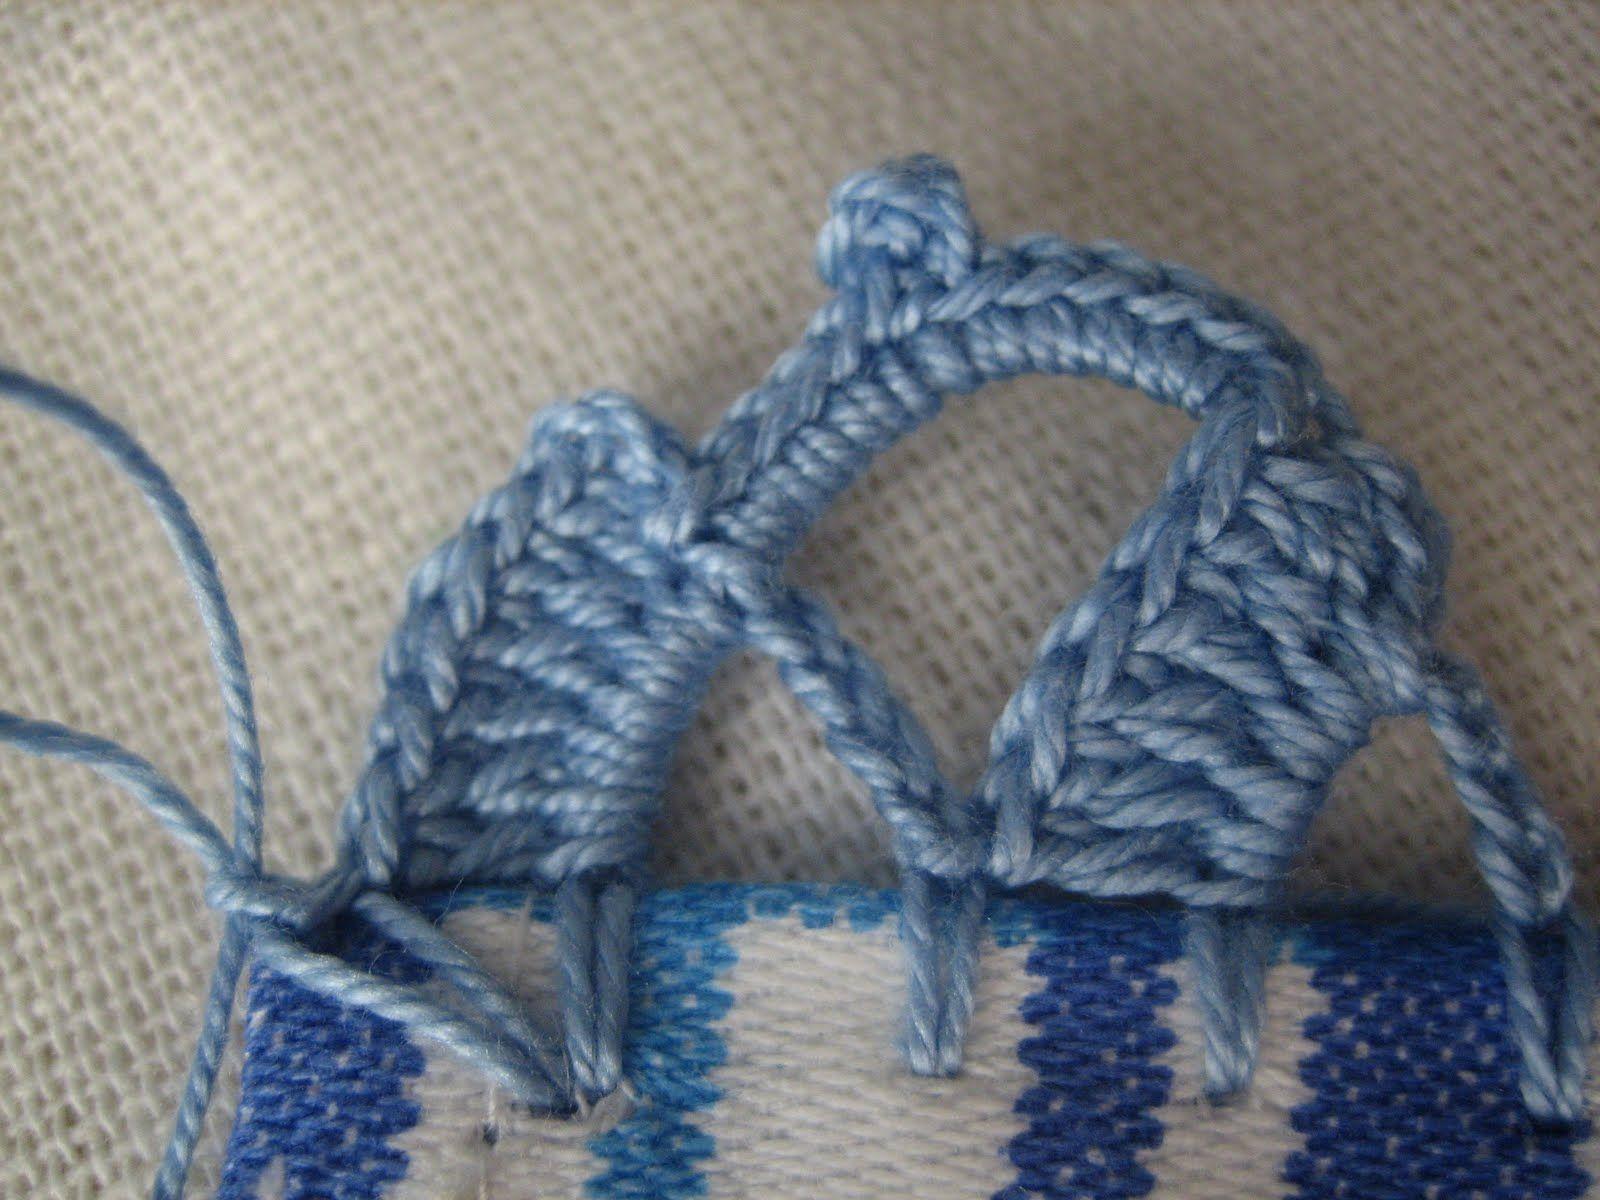 Filomena Crochet E Outros Lavores Bico De Crochet Bico De